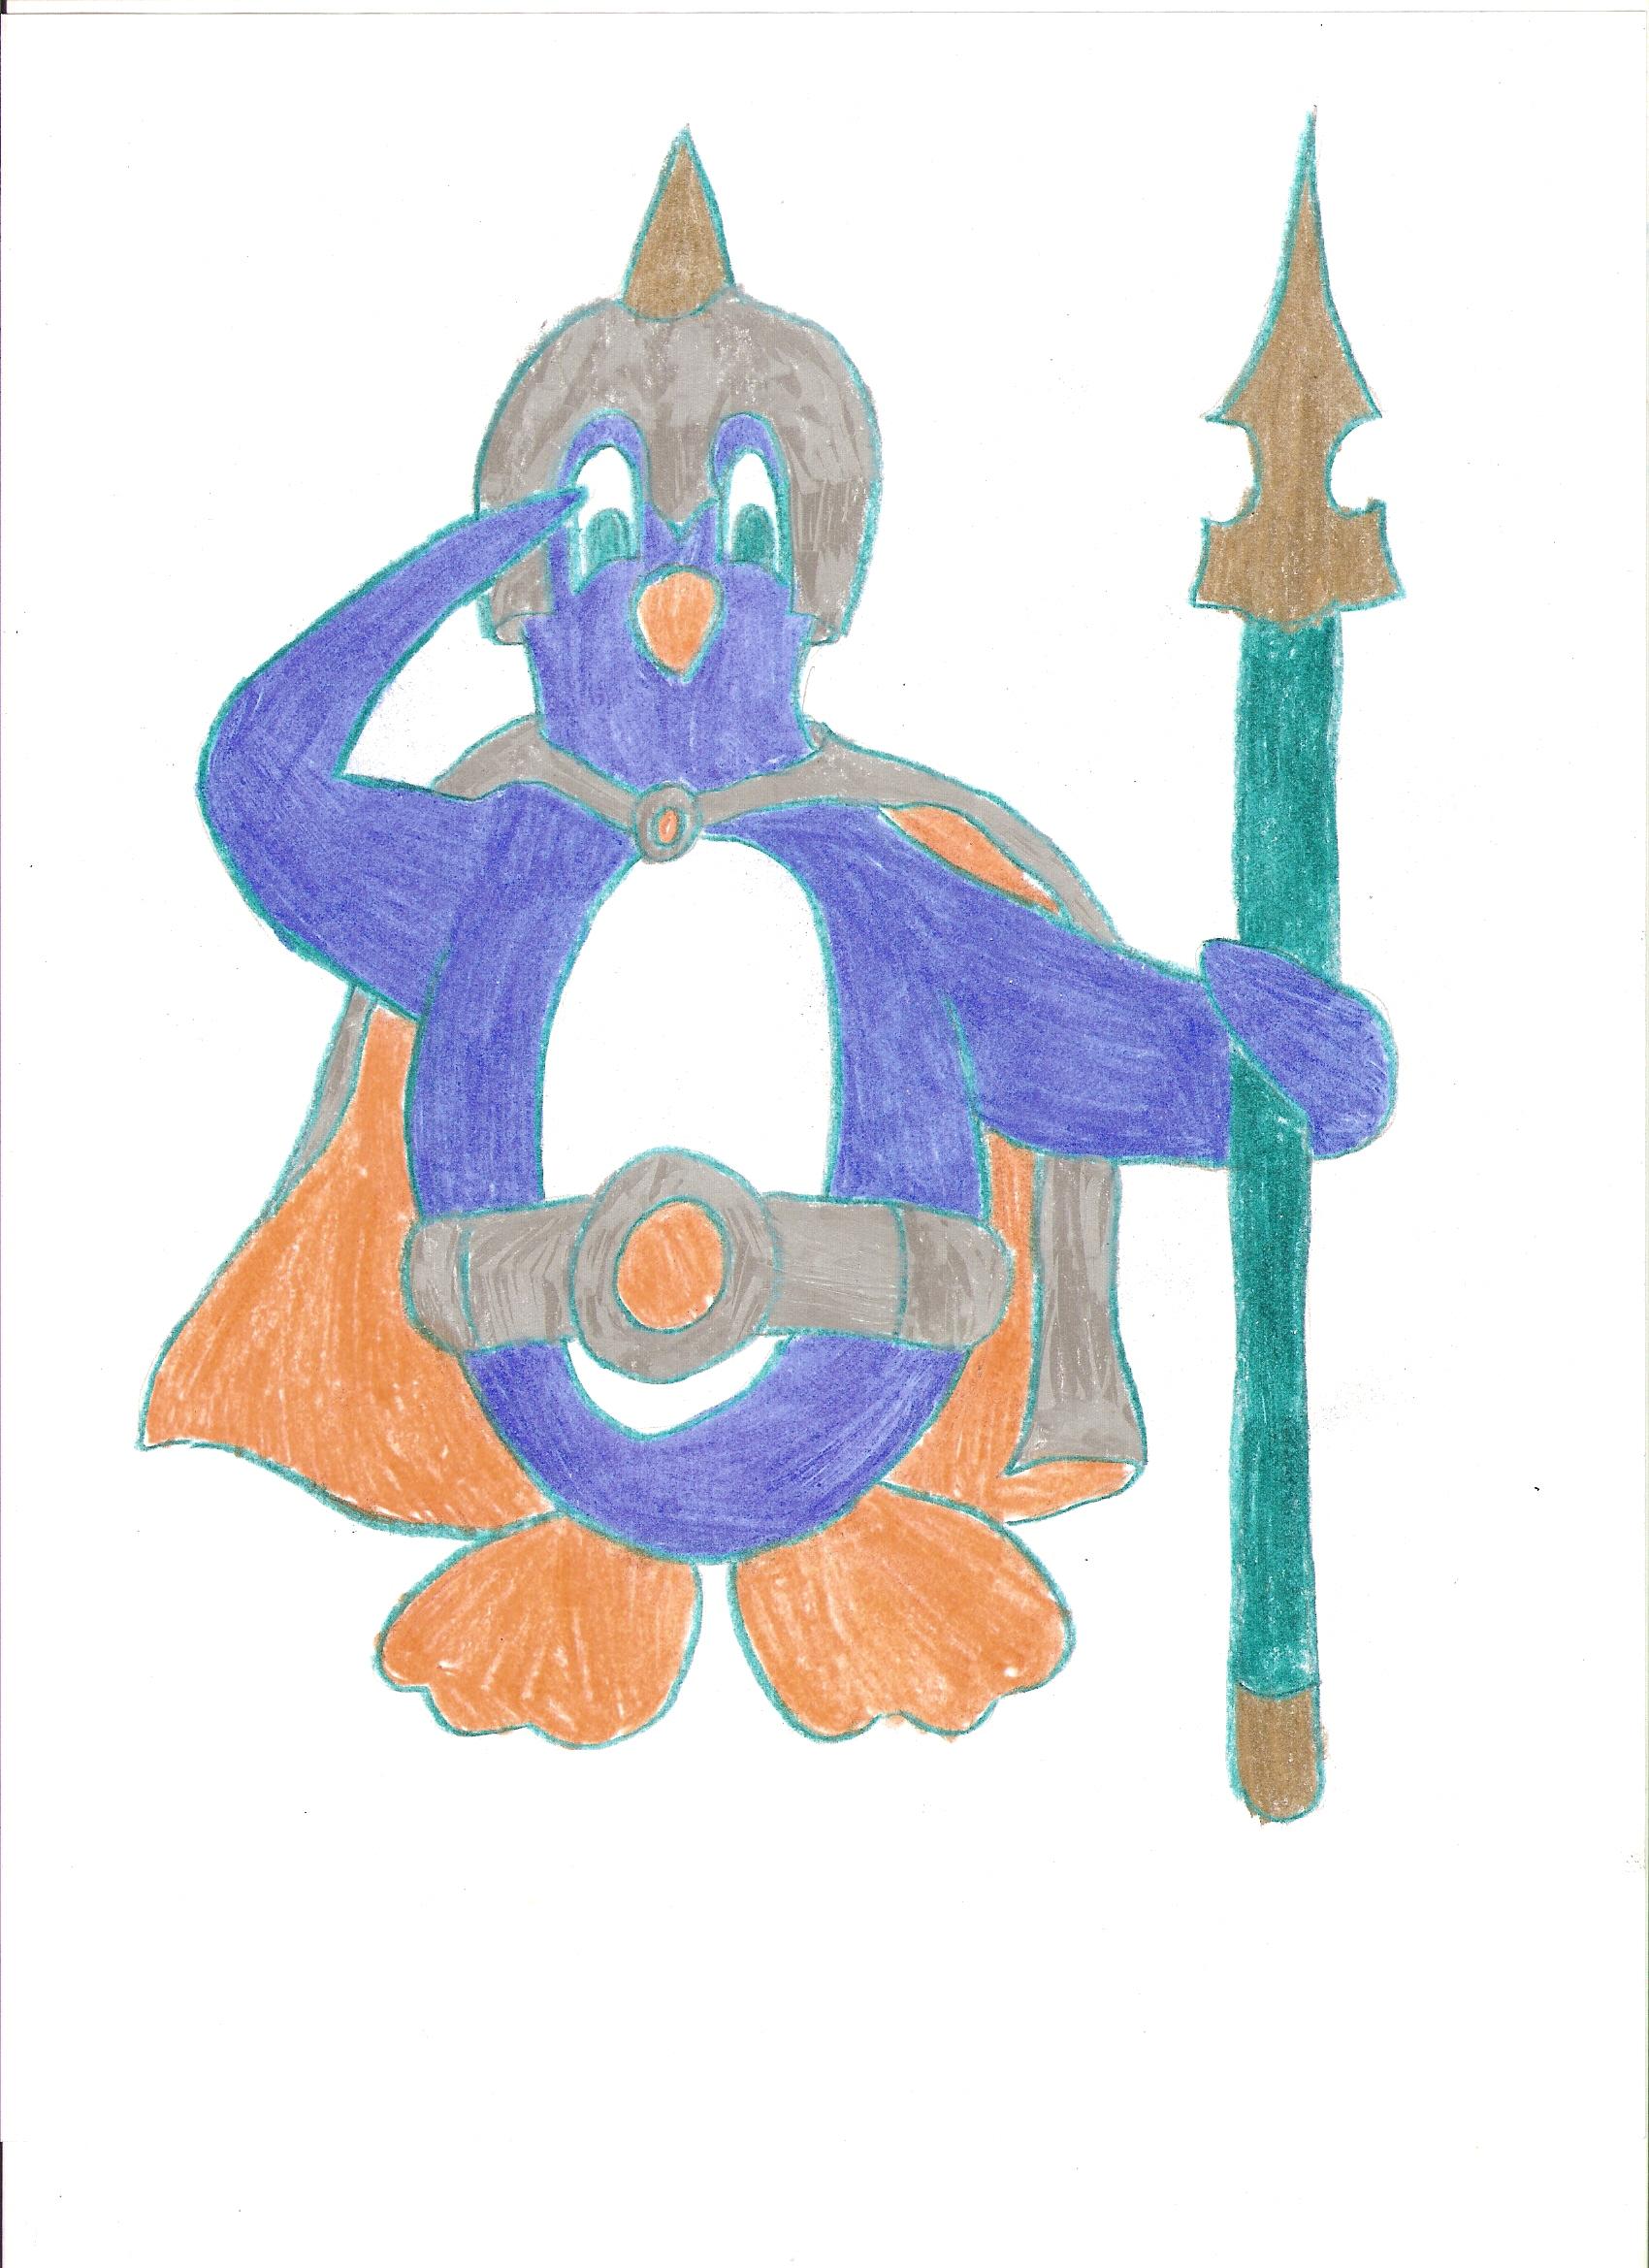 Pinguen Knight